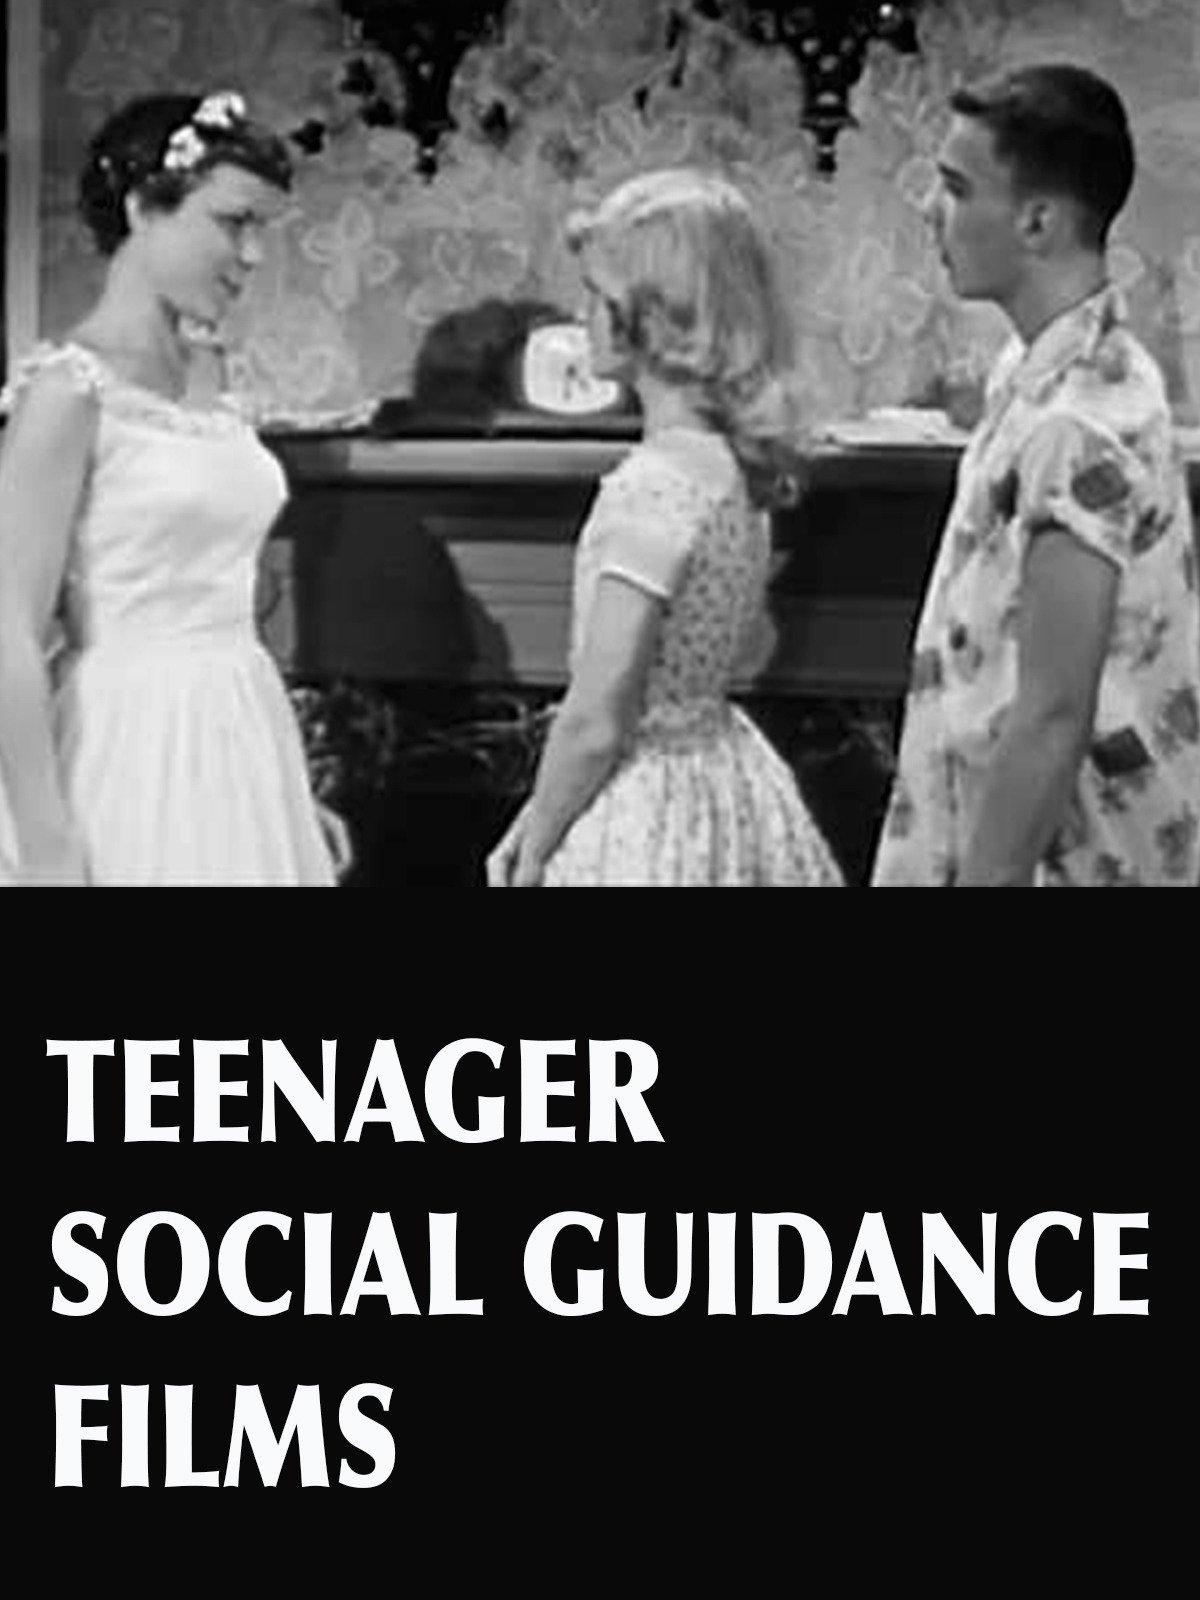 Teenage Social Guidance Films